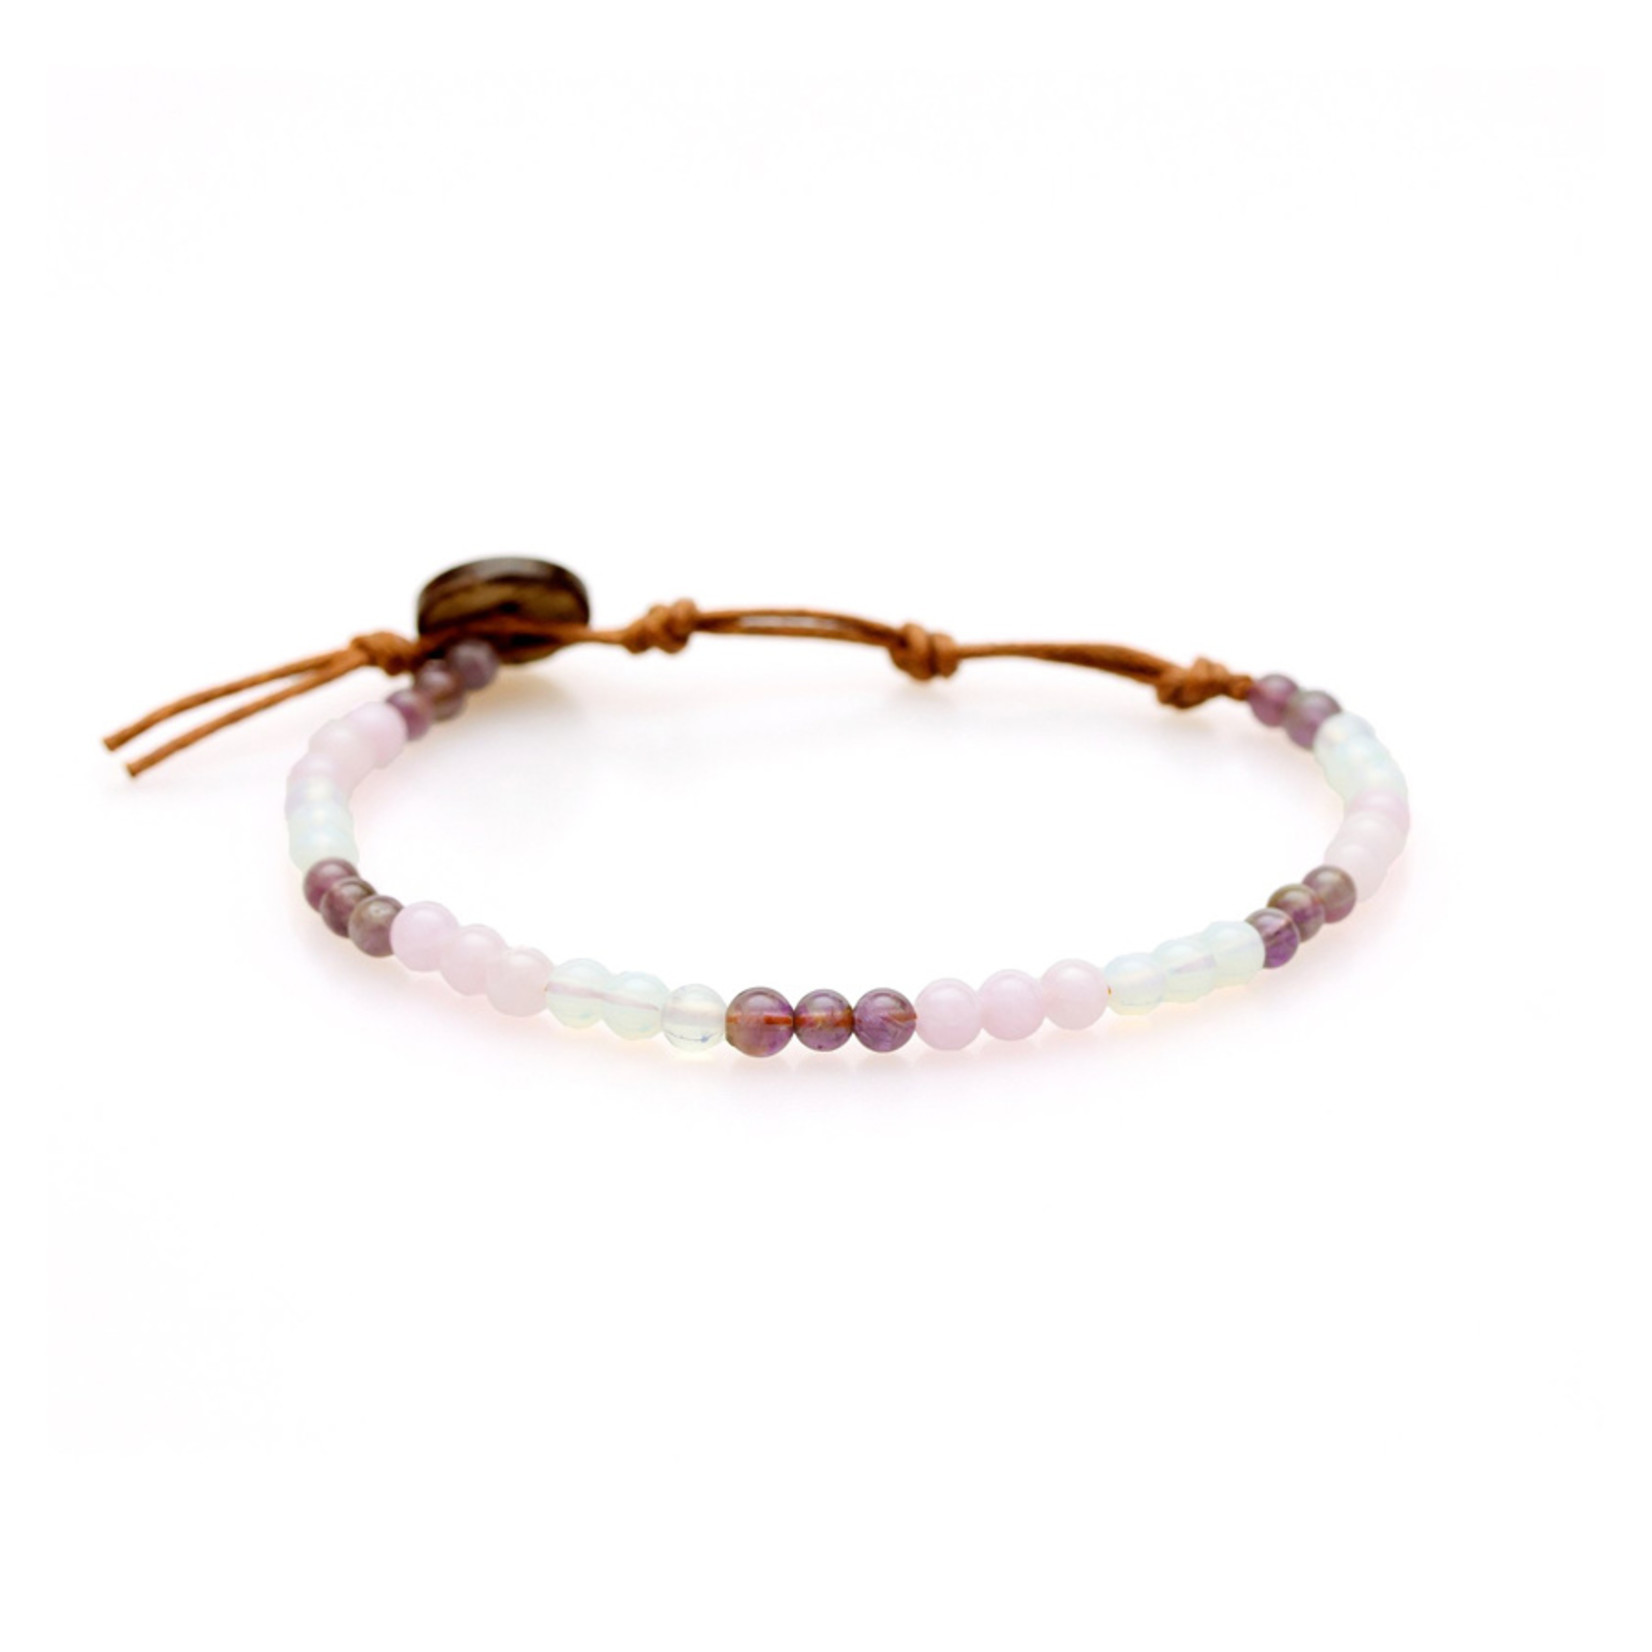 Lotus and Luna 4mm Healing Bracelet